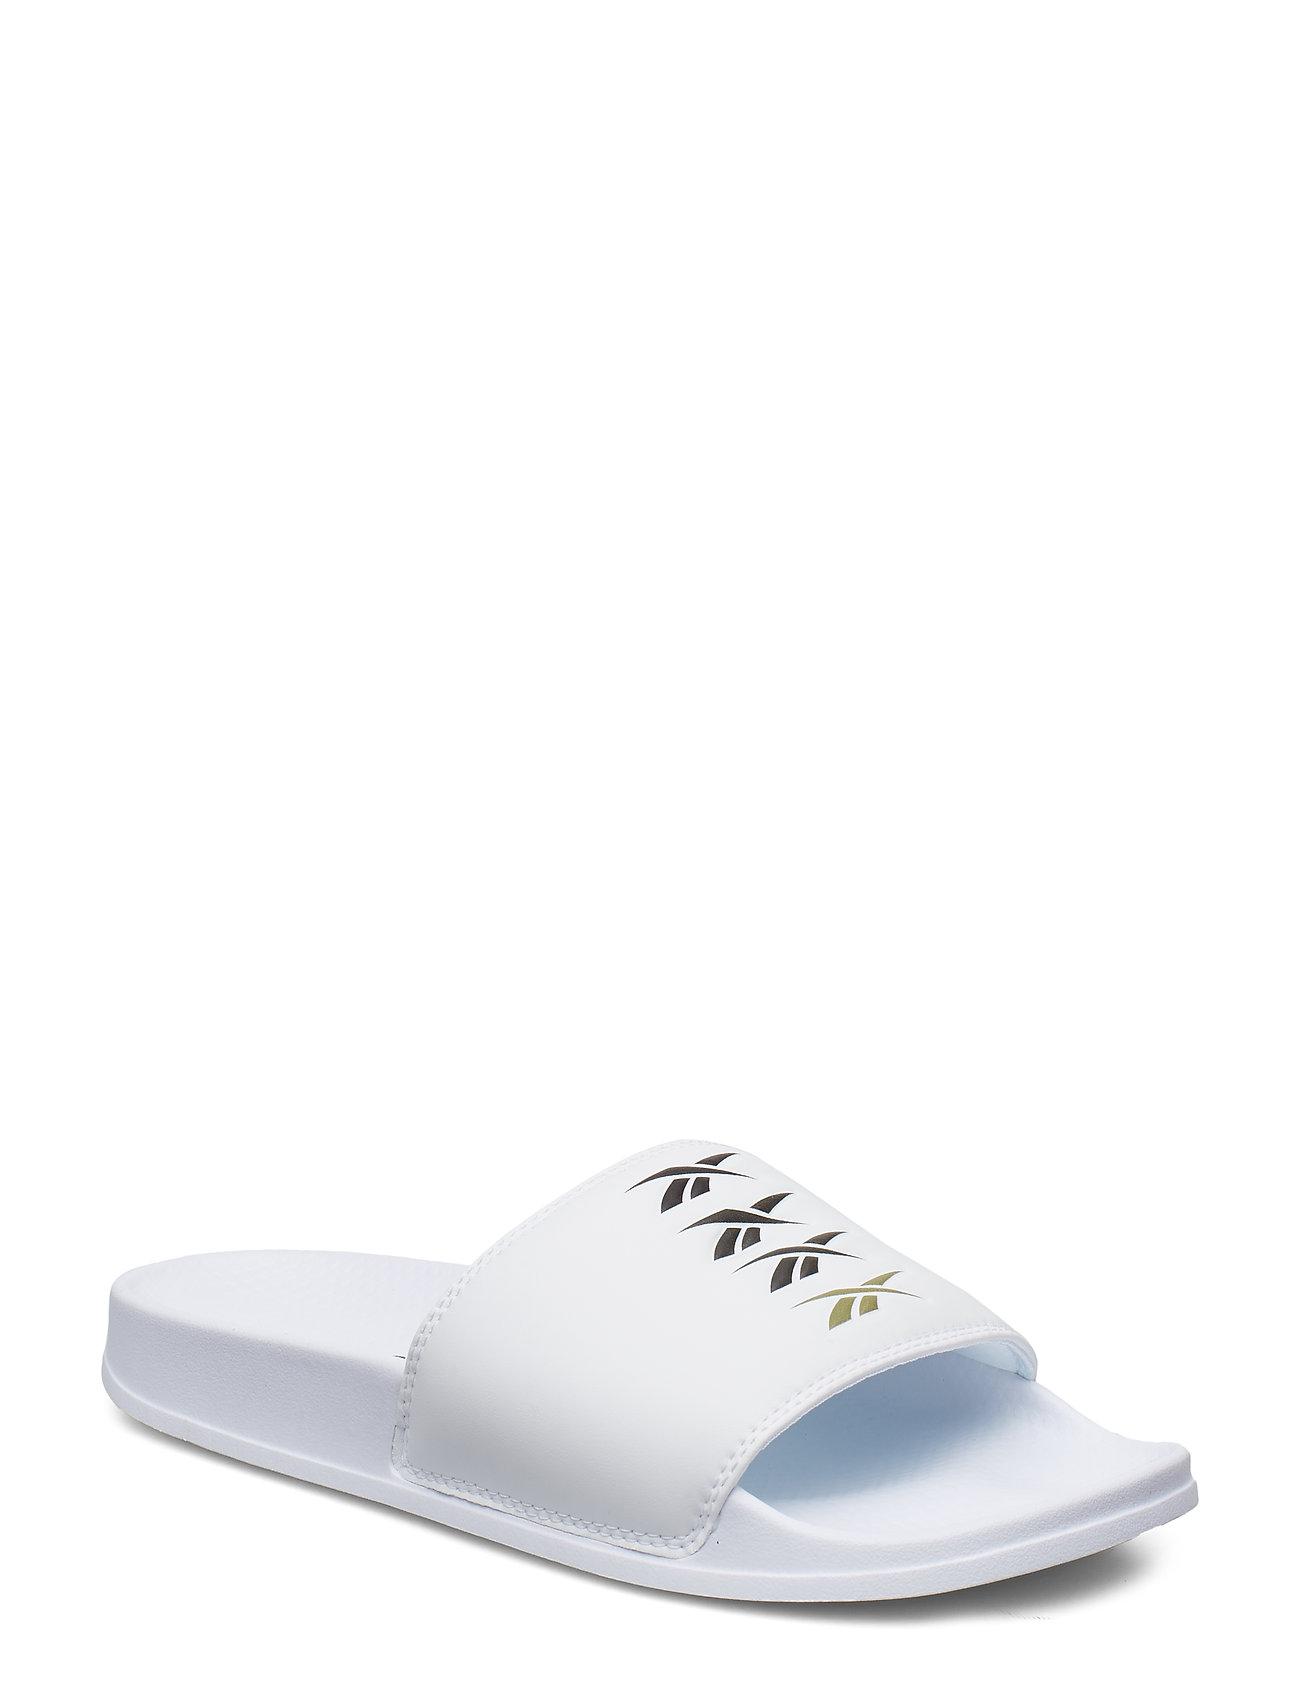 Image of Reebok Classic Slide Sandaler Pool Sliders Slip-in Hvid Reebok Classics (3207952071)